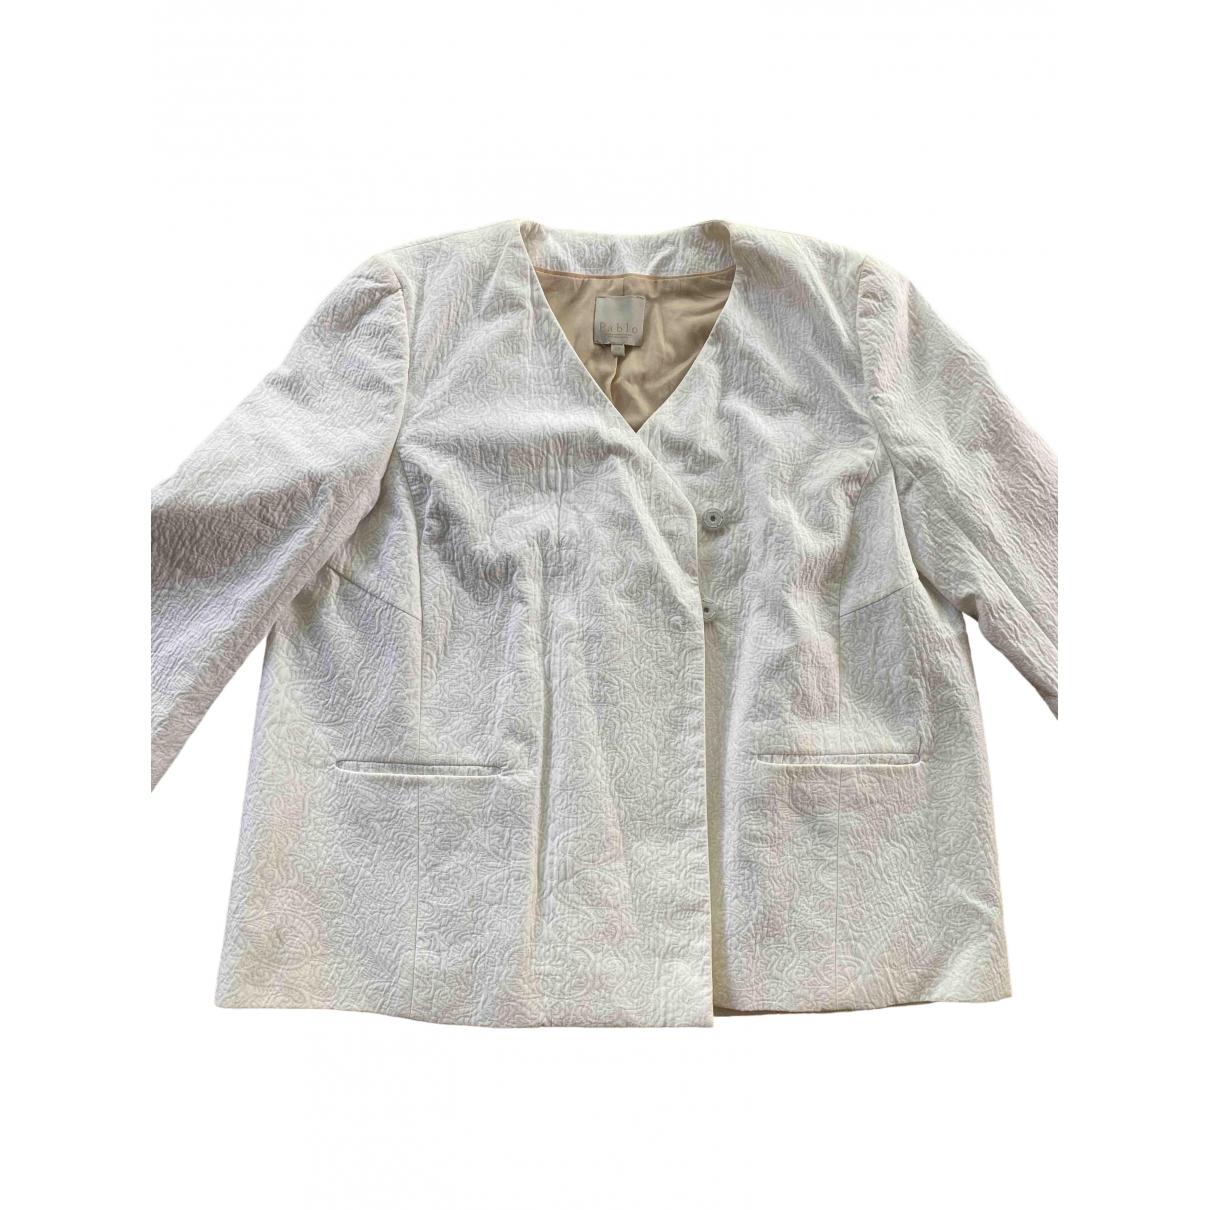 Pablo \N White Cotton jacket for Women 40 FR